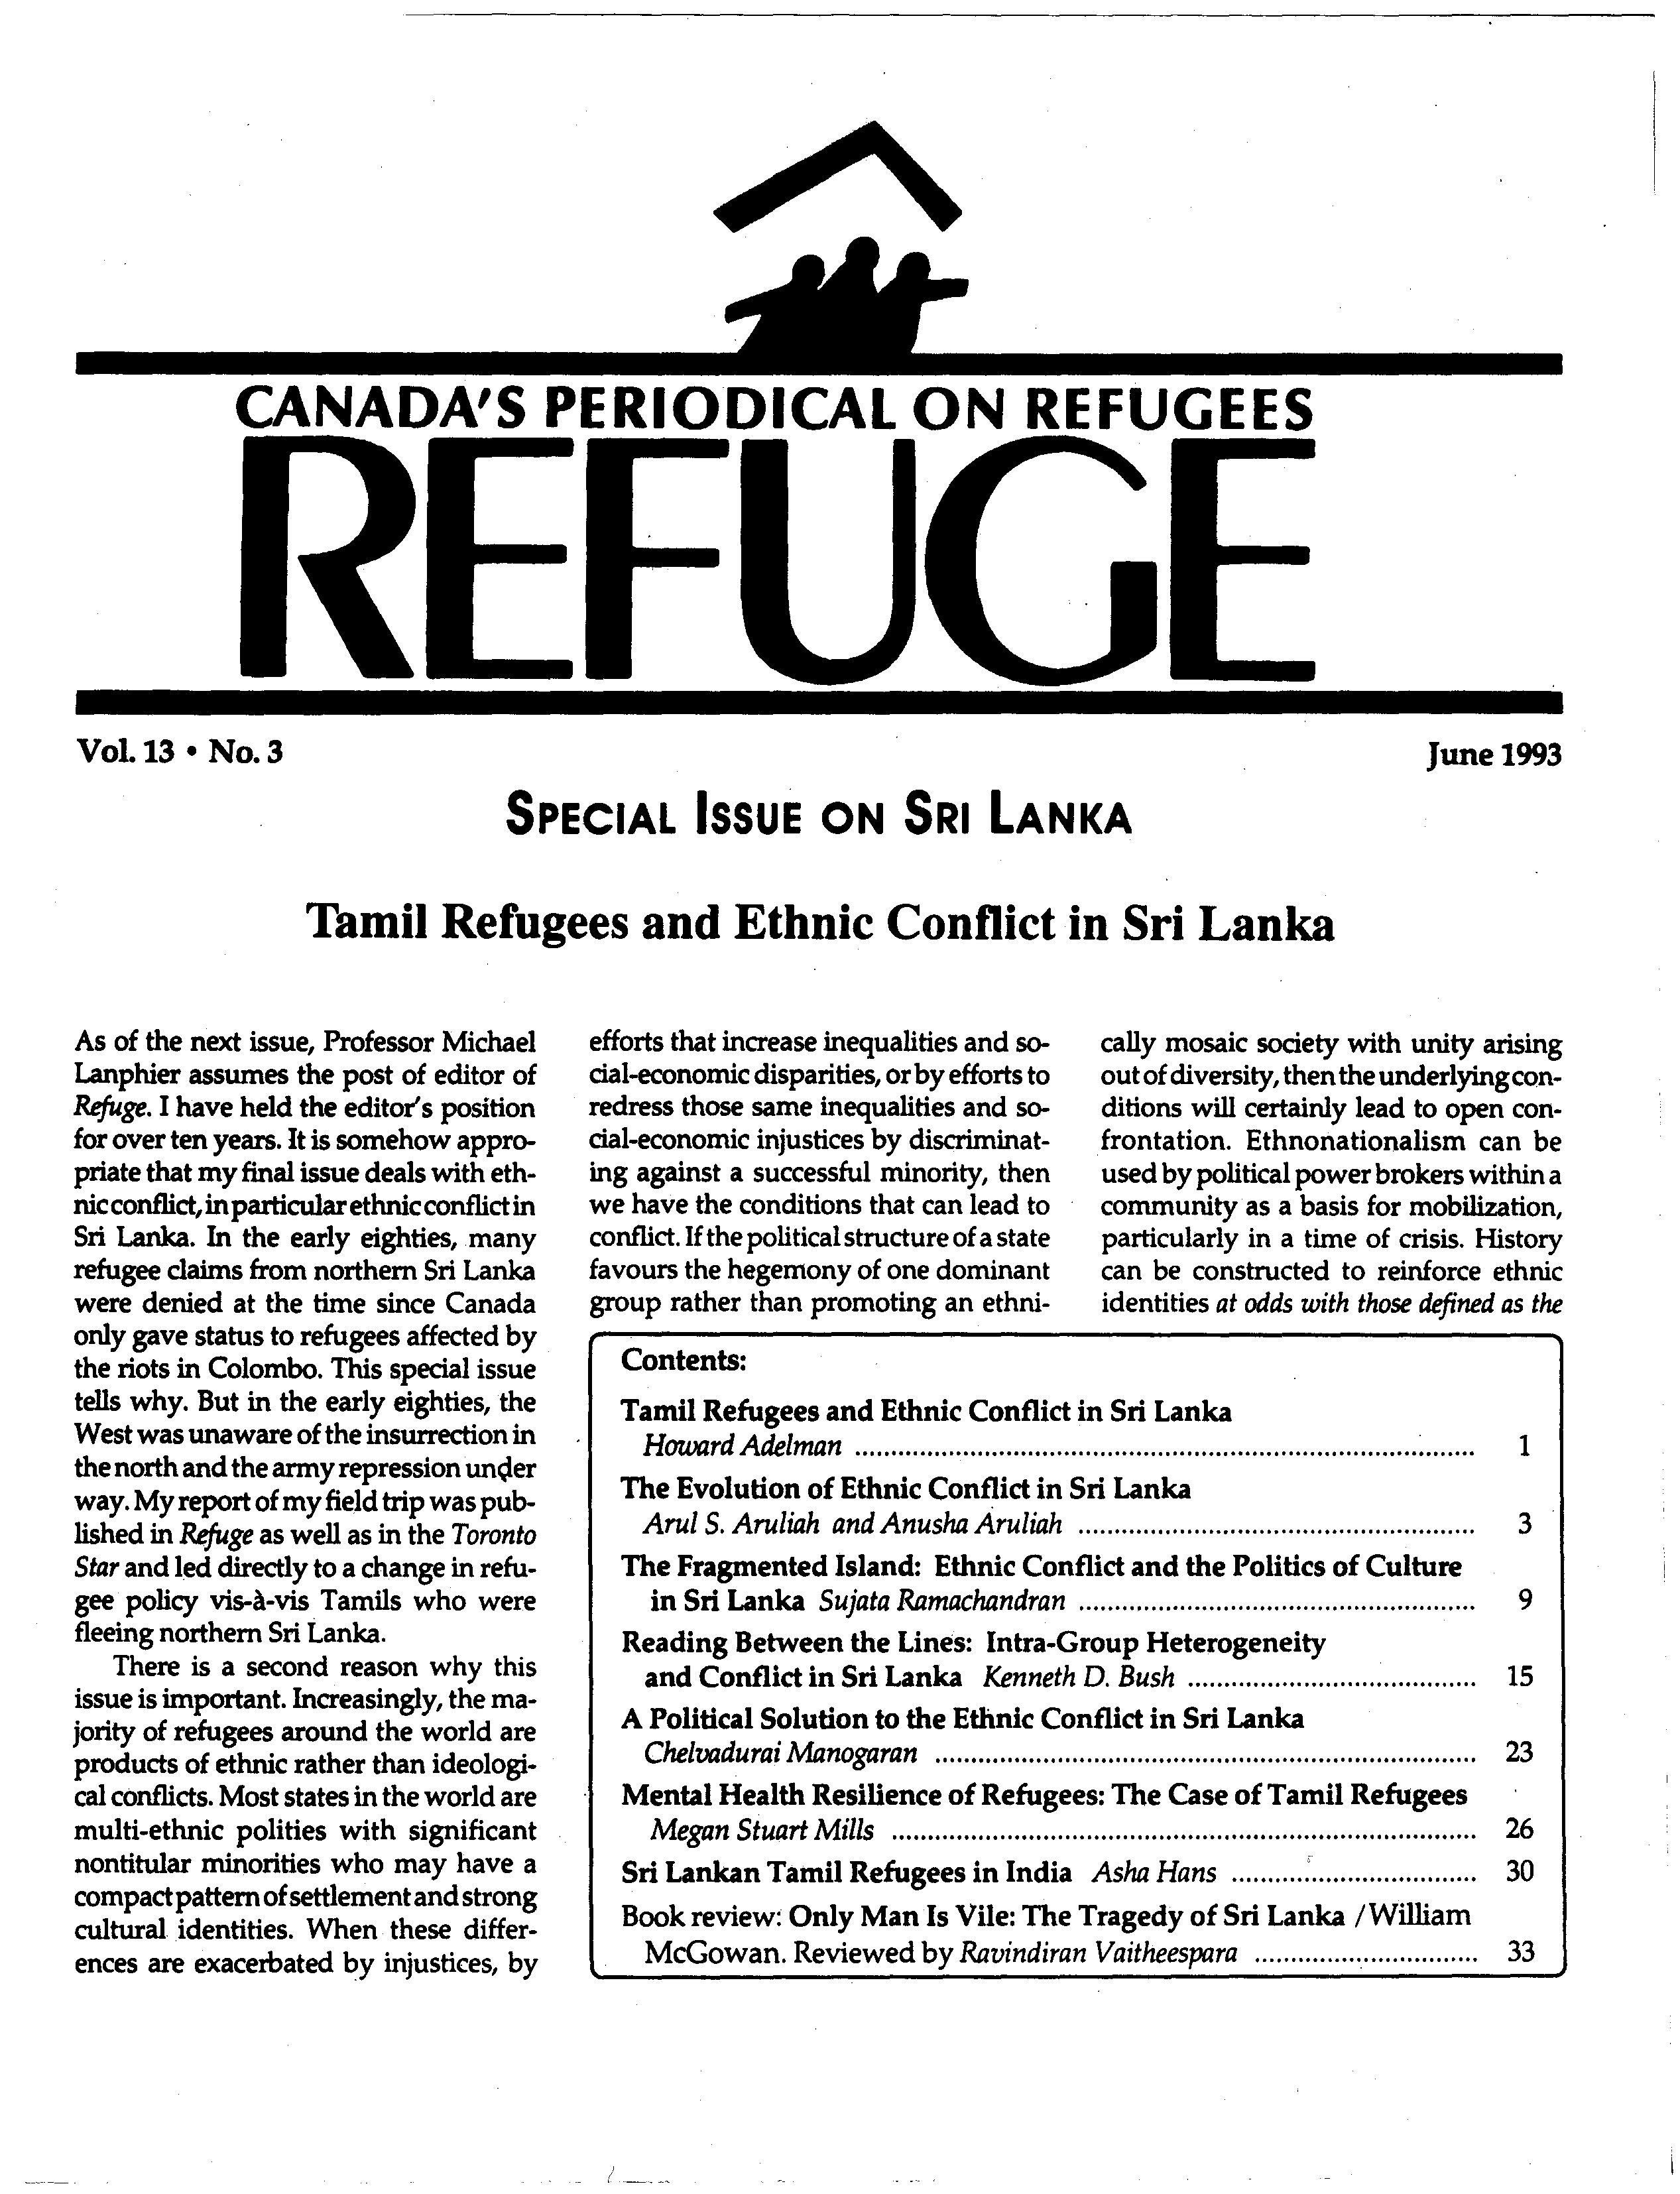 first page Refuge vol. 13.3 1993